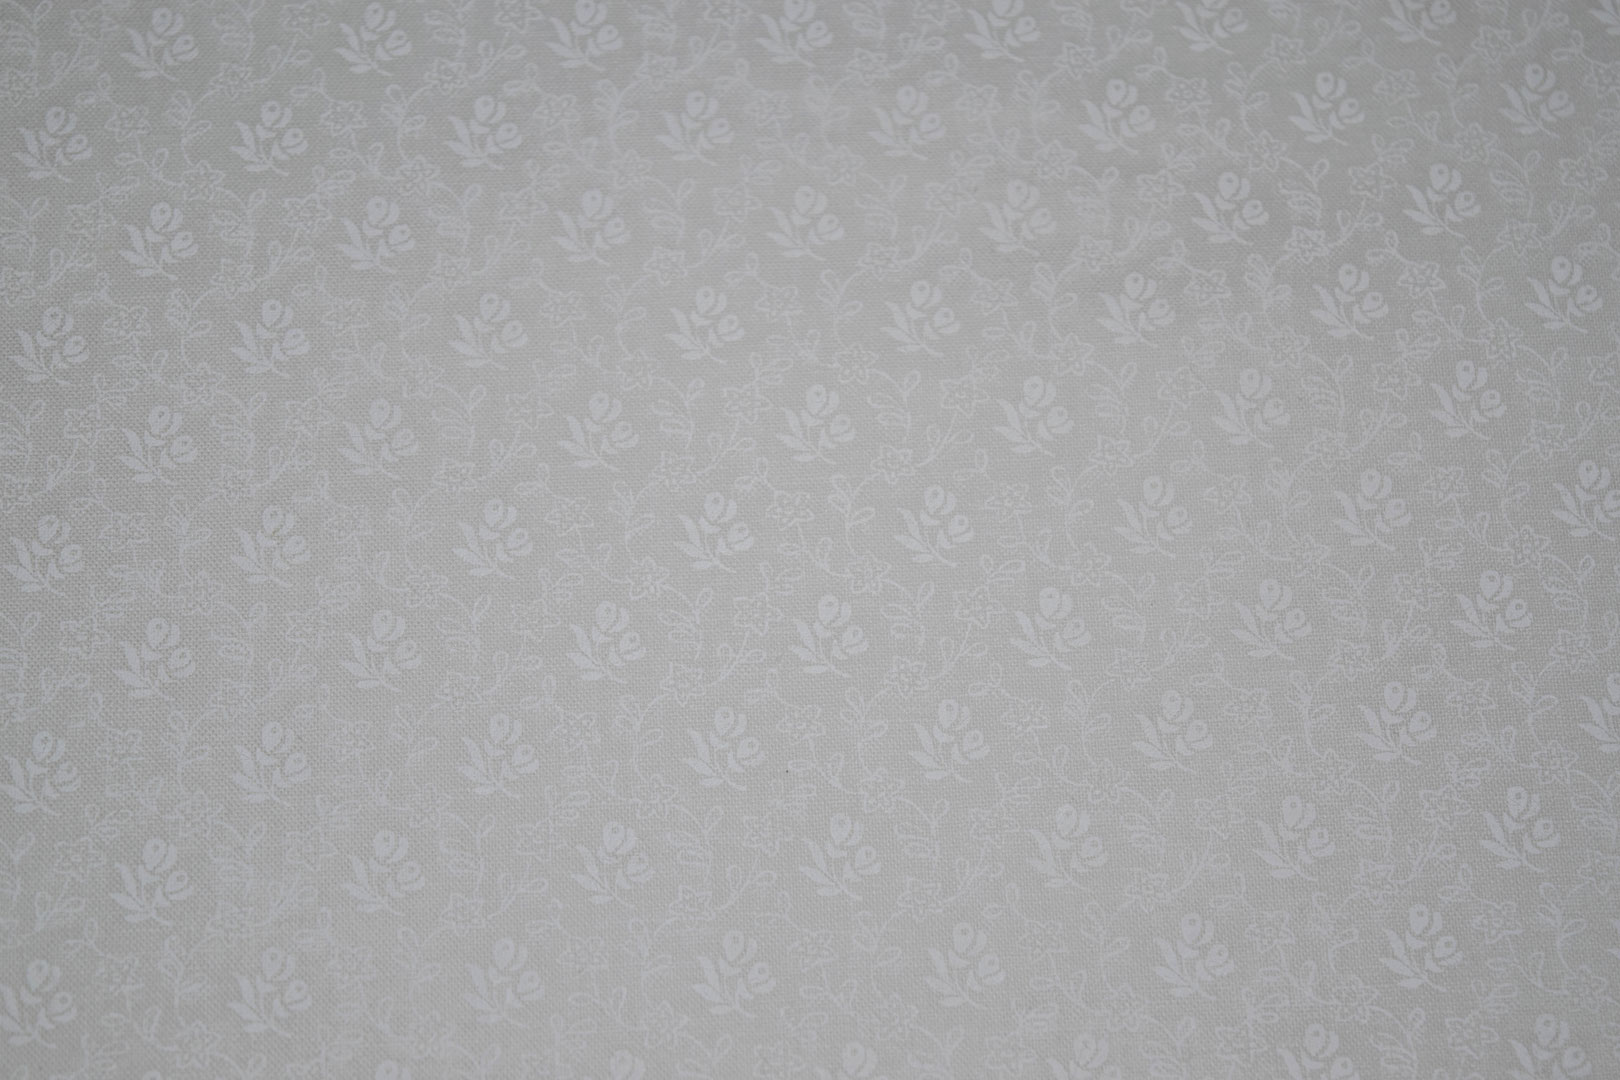 "8_21113_ww   44/45"" 68/68, 100% Carded Cotton"